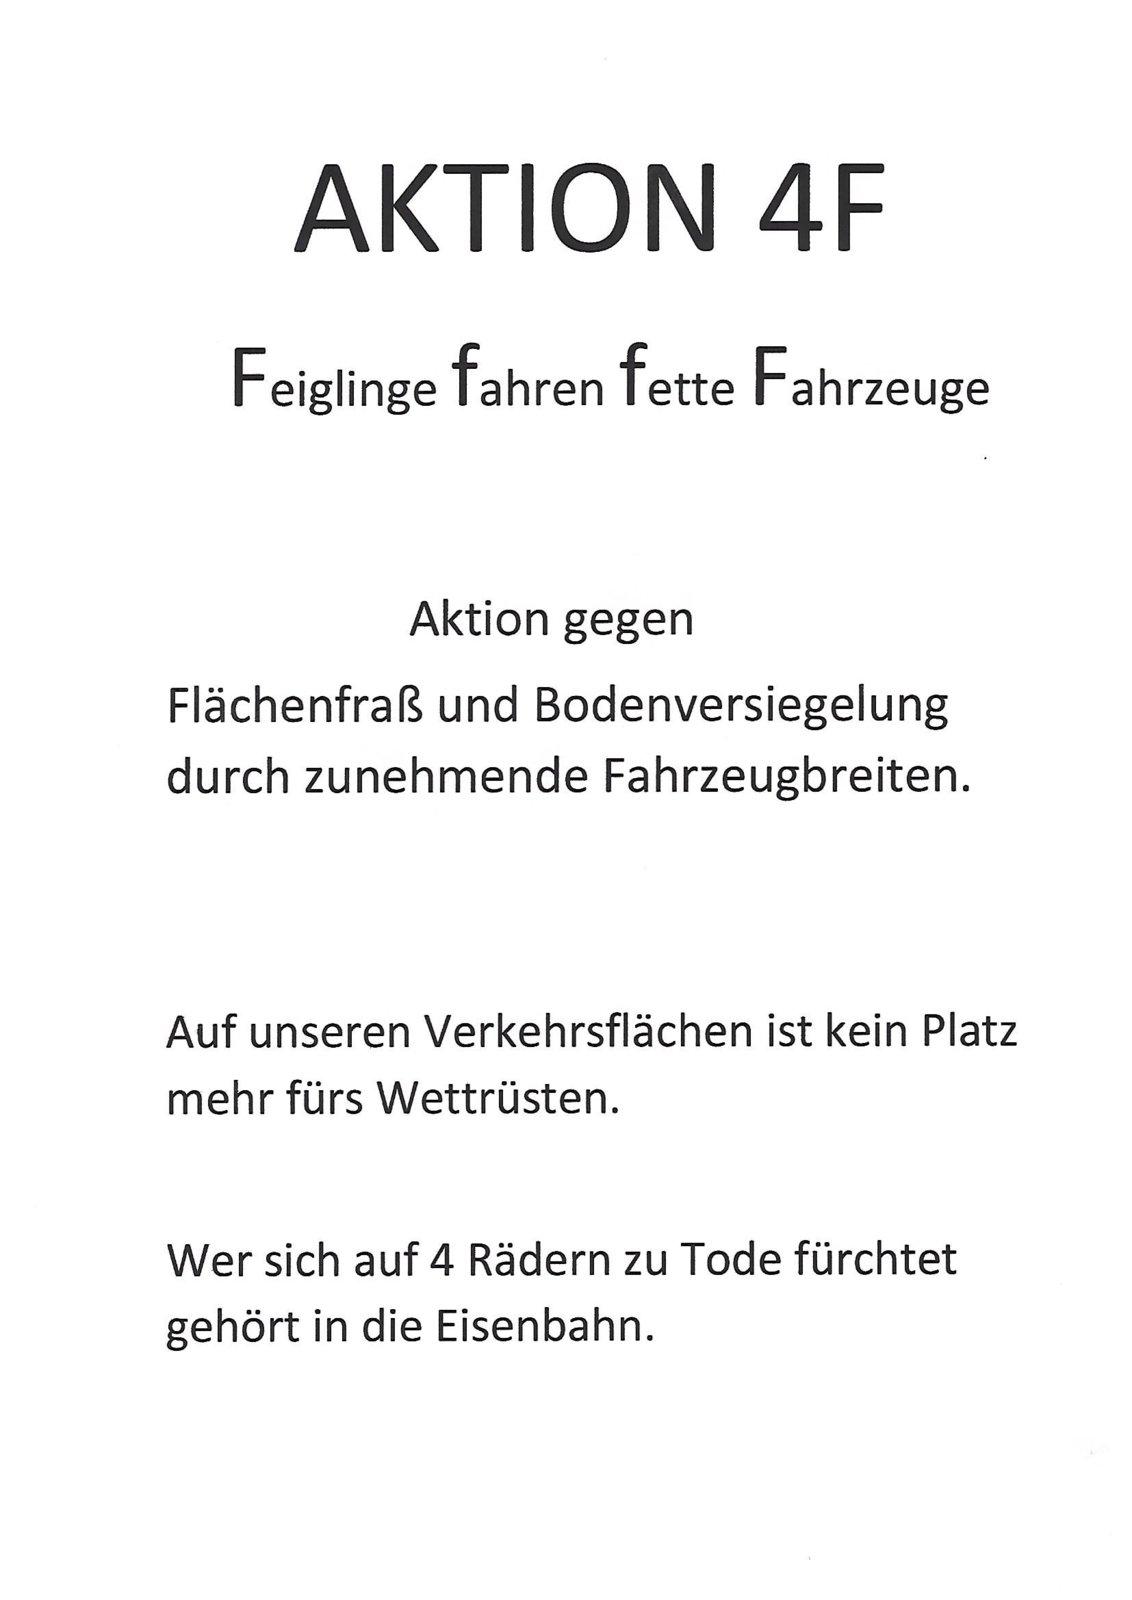 aktion-4f-jpg.3793